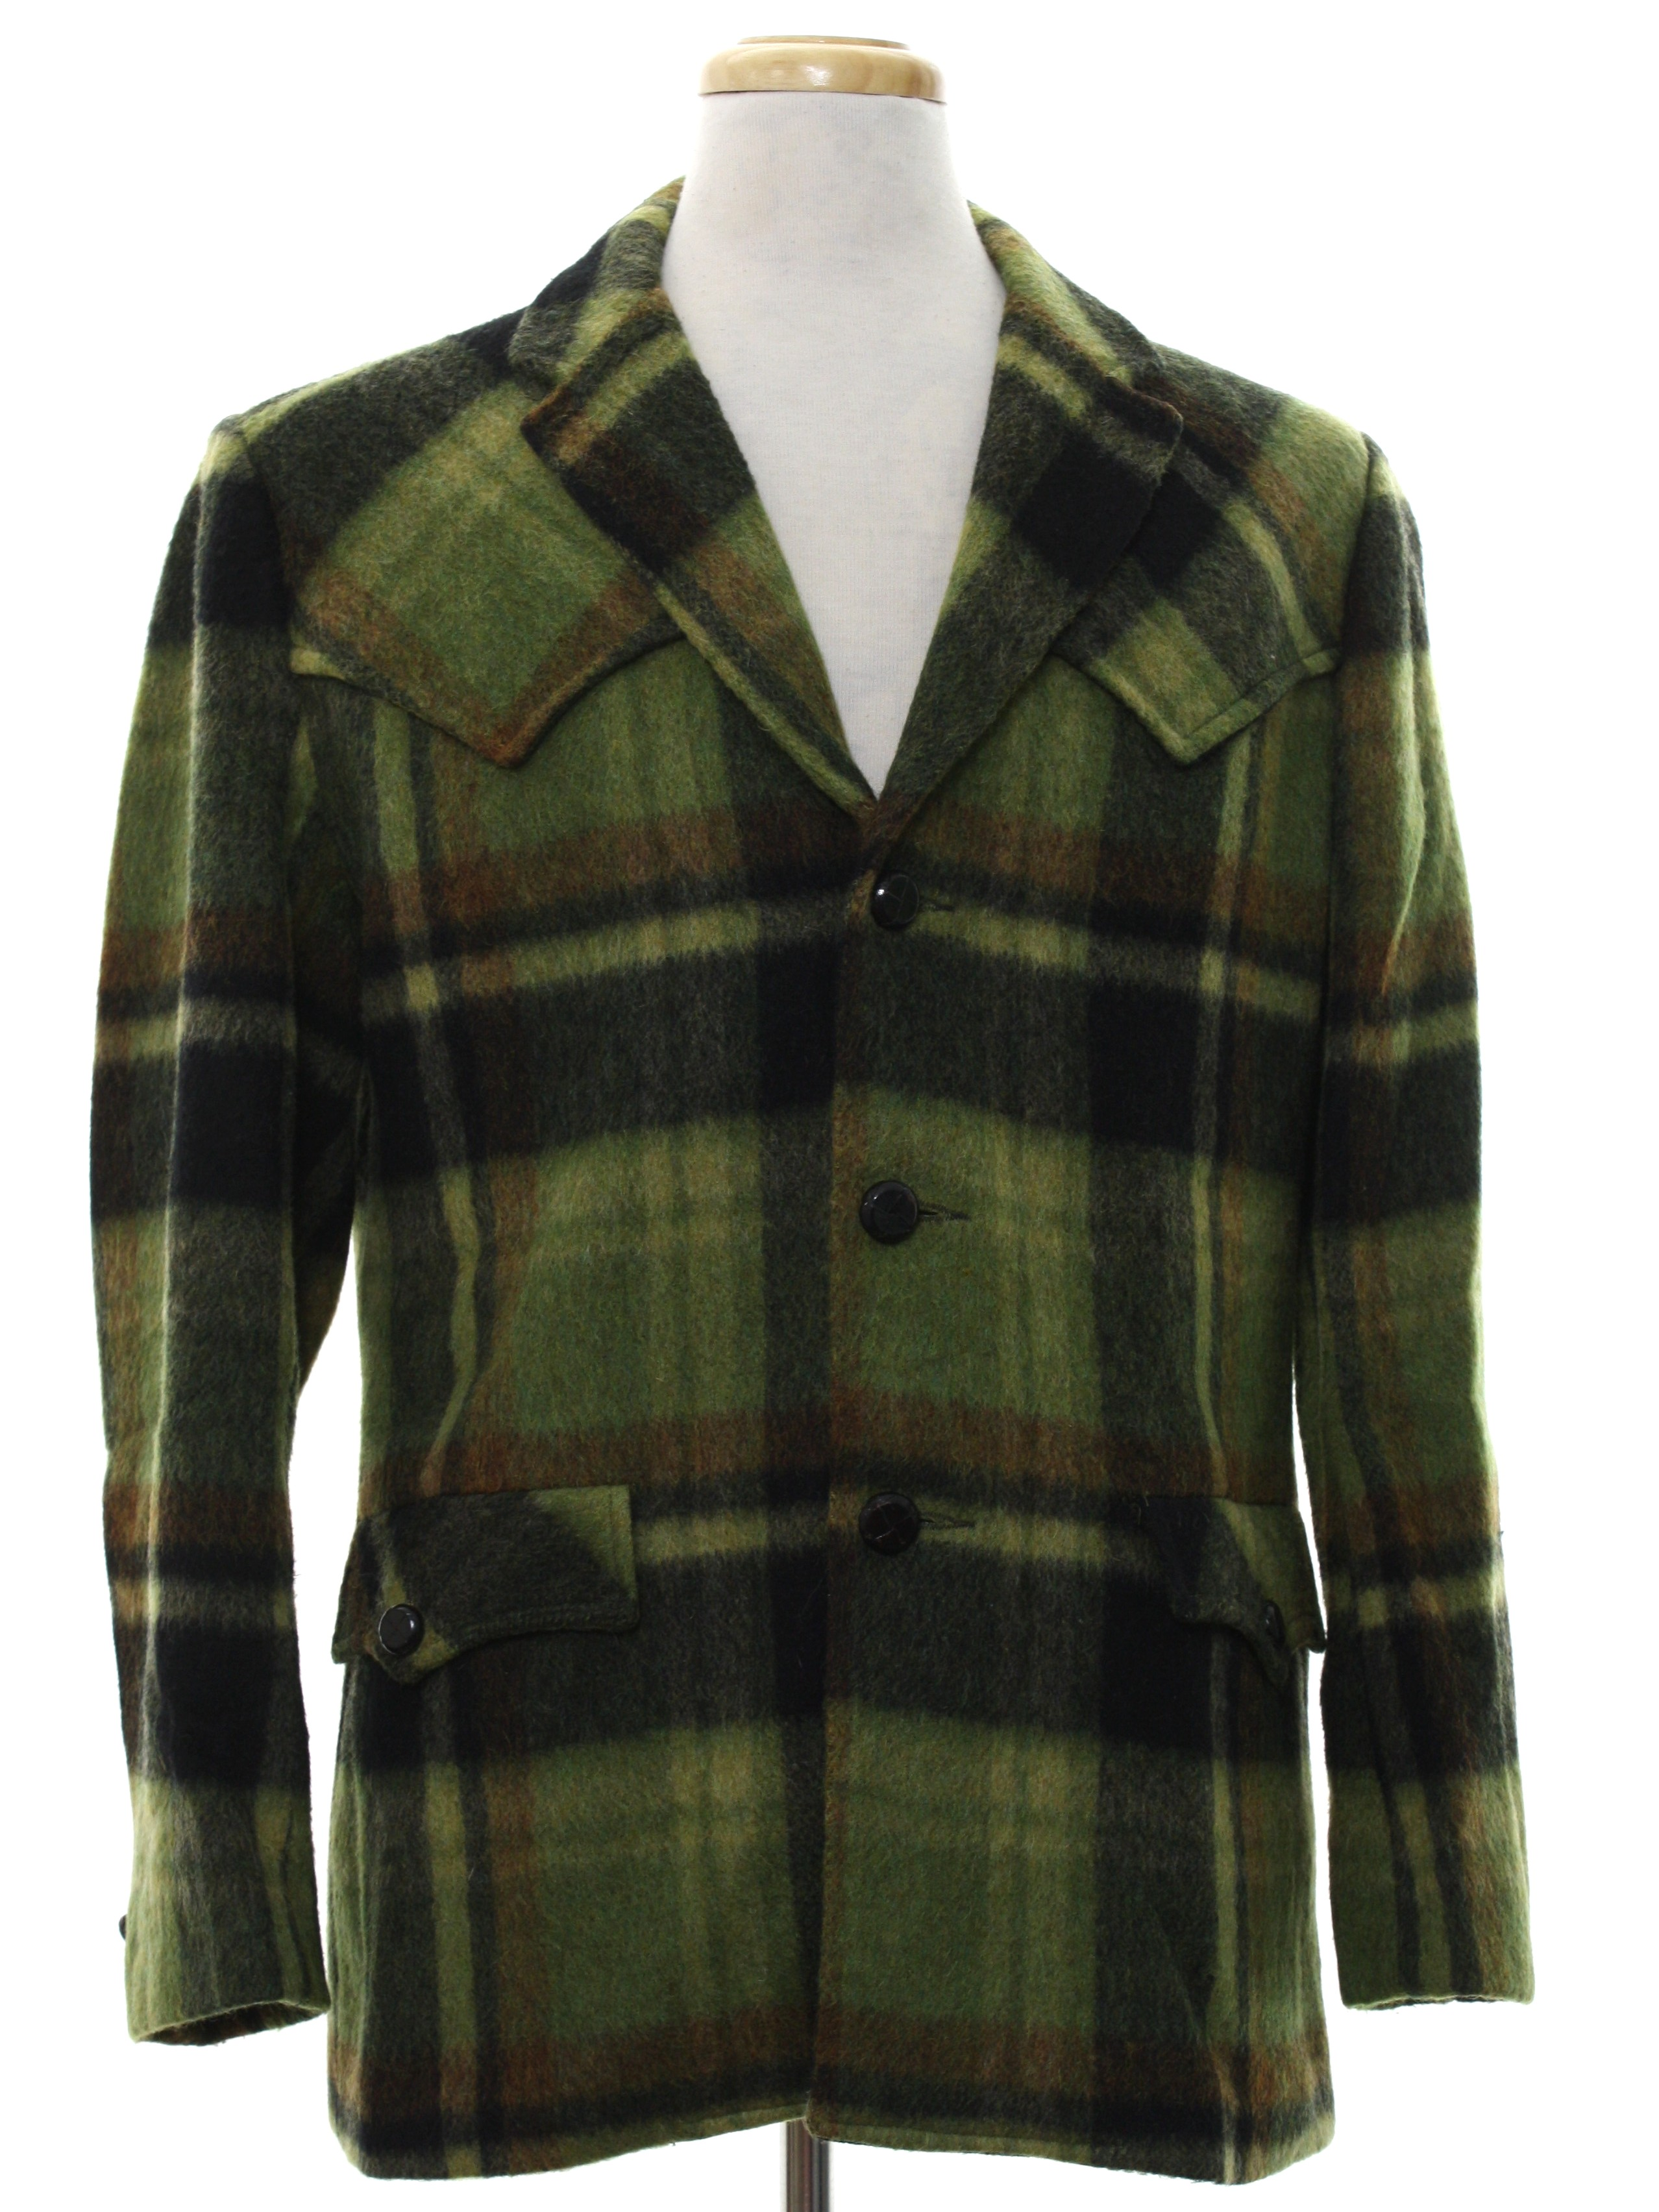 Retro Sixties Jacket 60s Trego Western Wear Mens Green